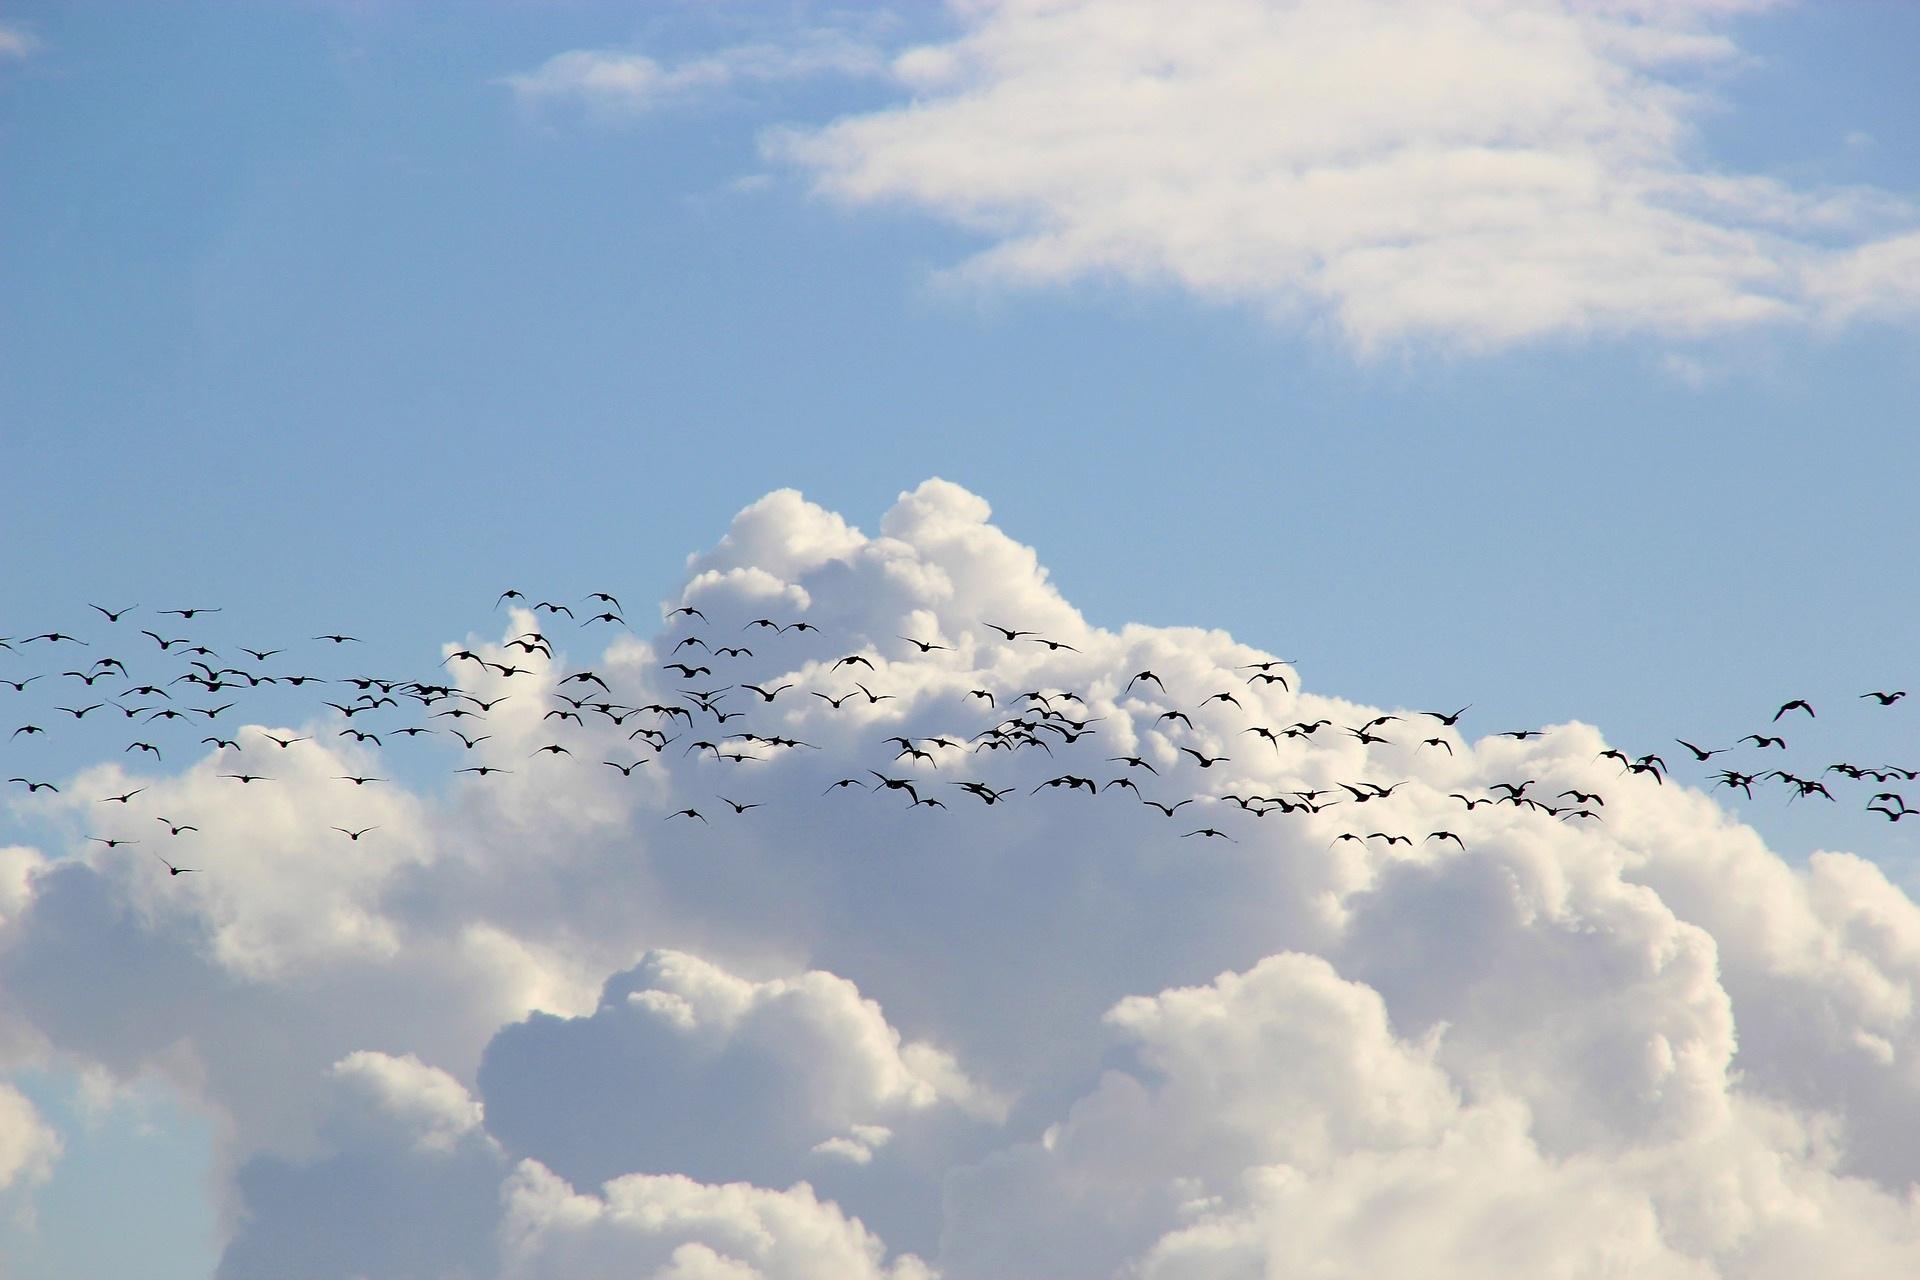 birds migrating